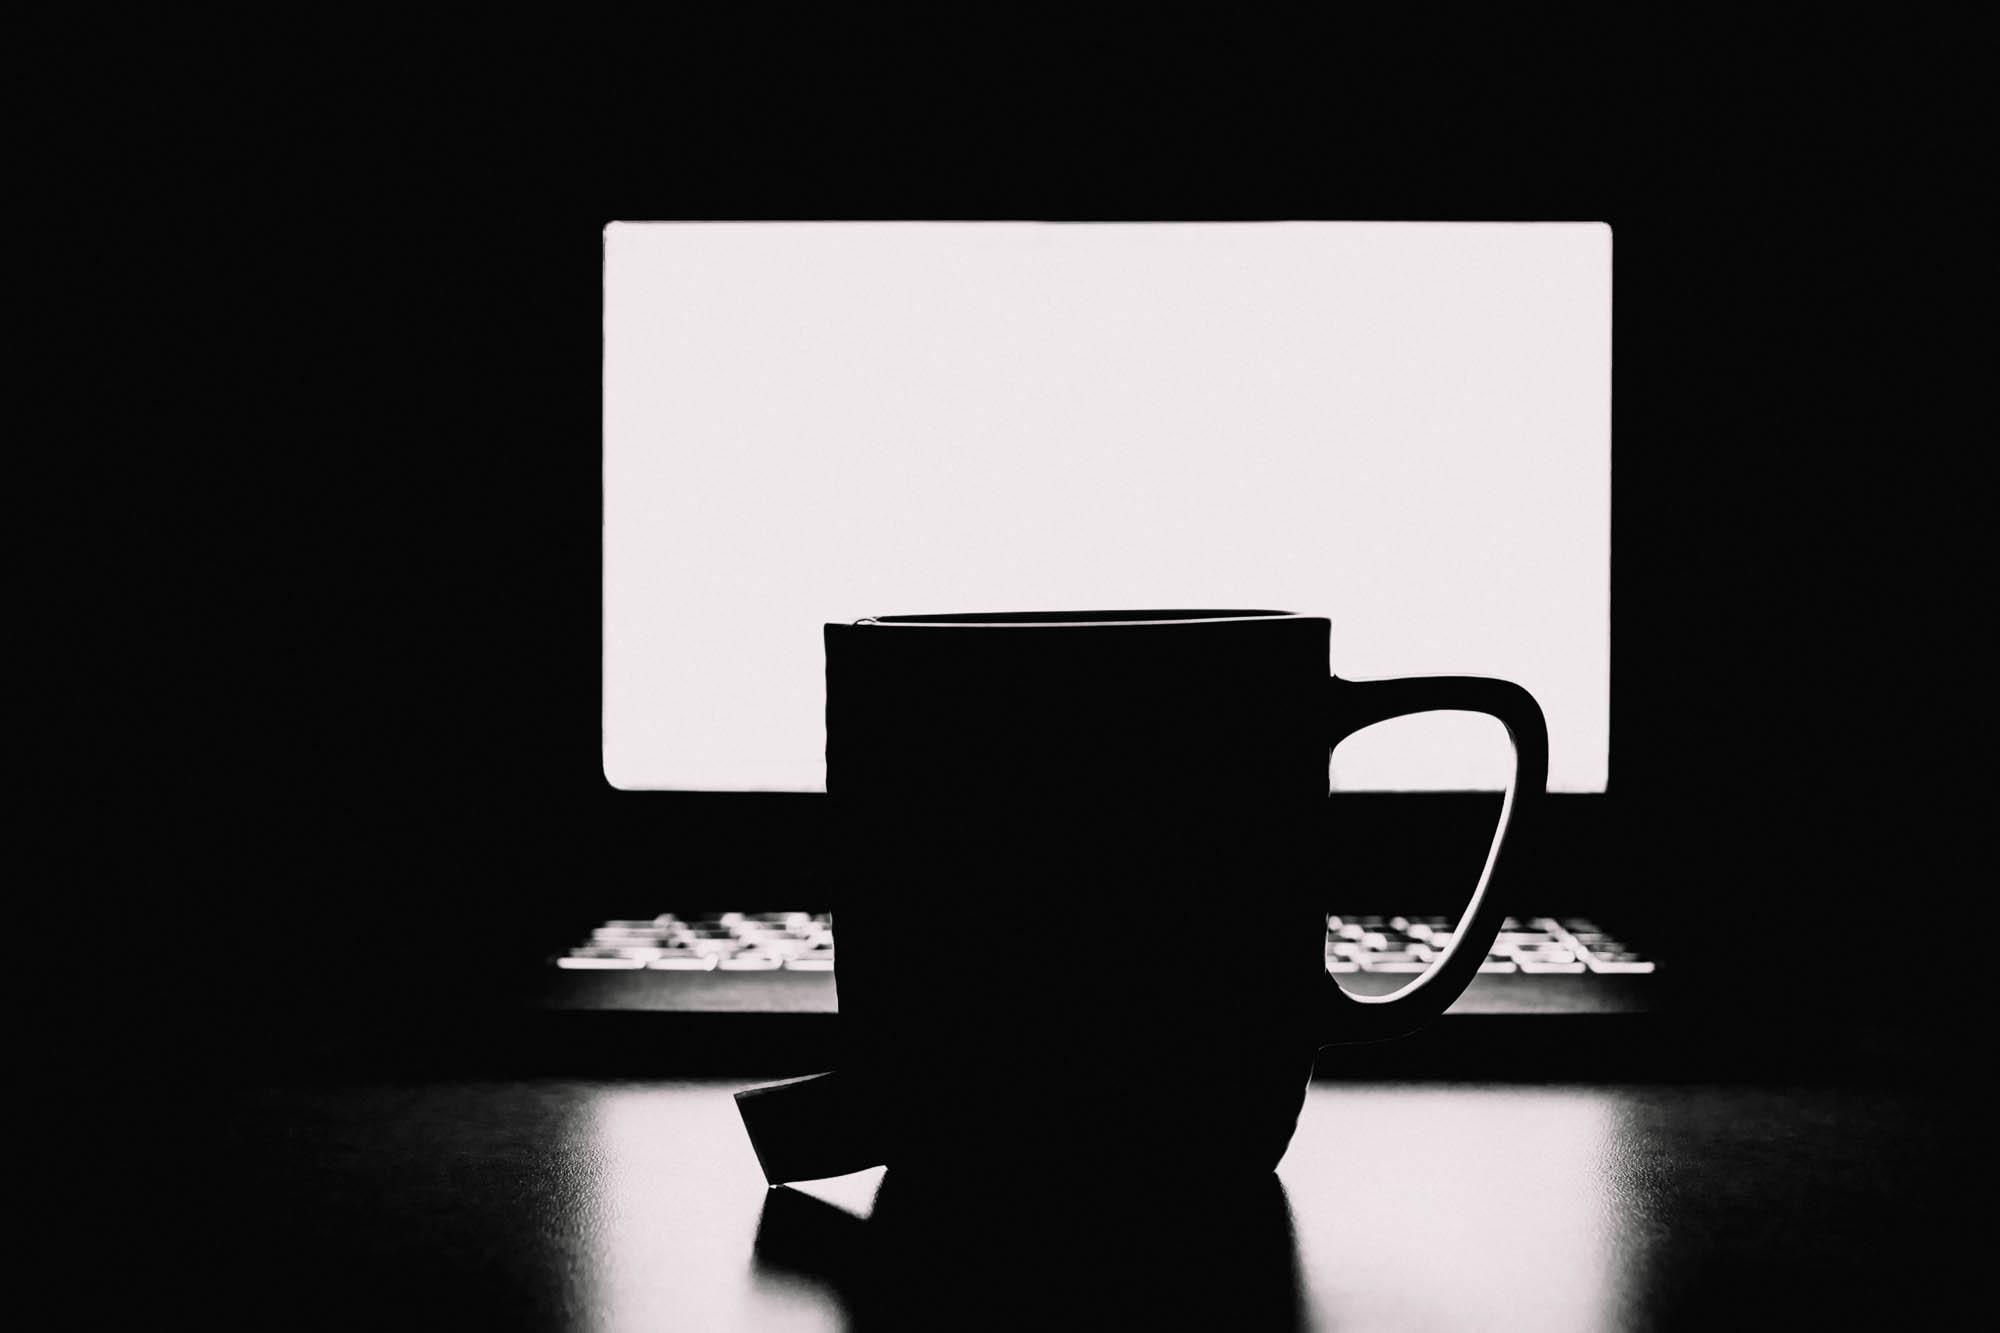 The glow of the computer screen silhouetting a mug